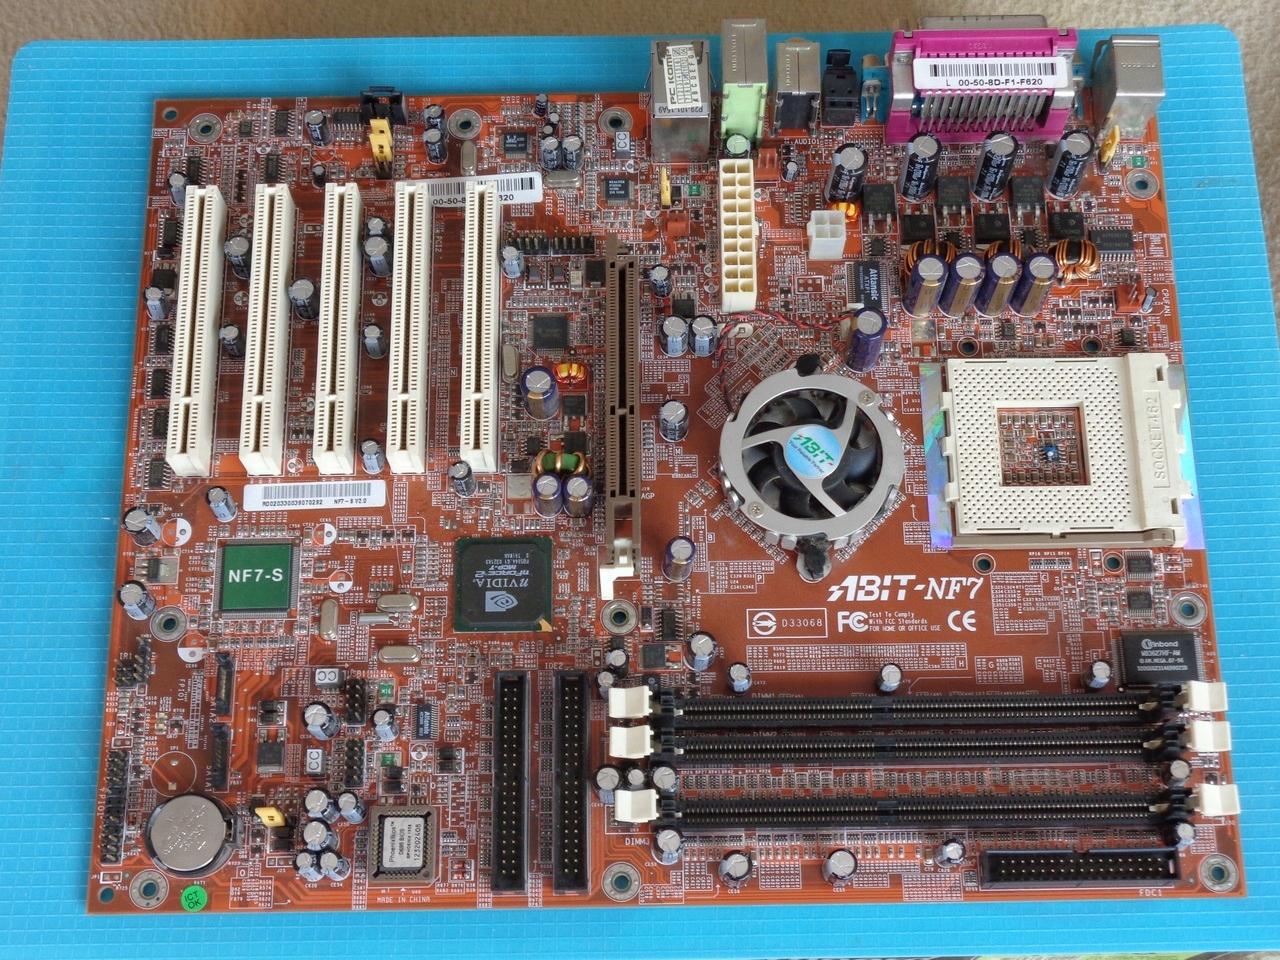 płyta gł ABIT NF7-S v2 0 AMD socketA/462 sata raid